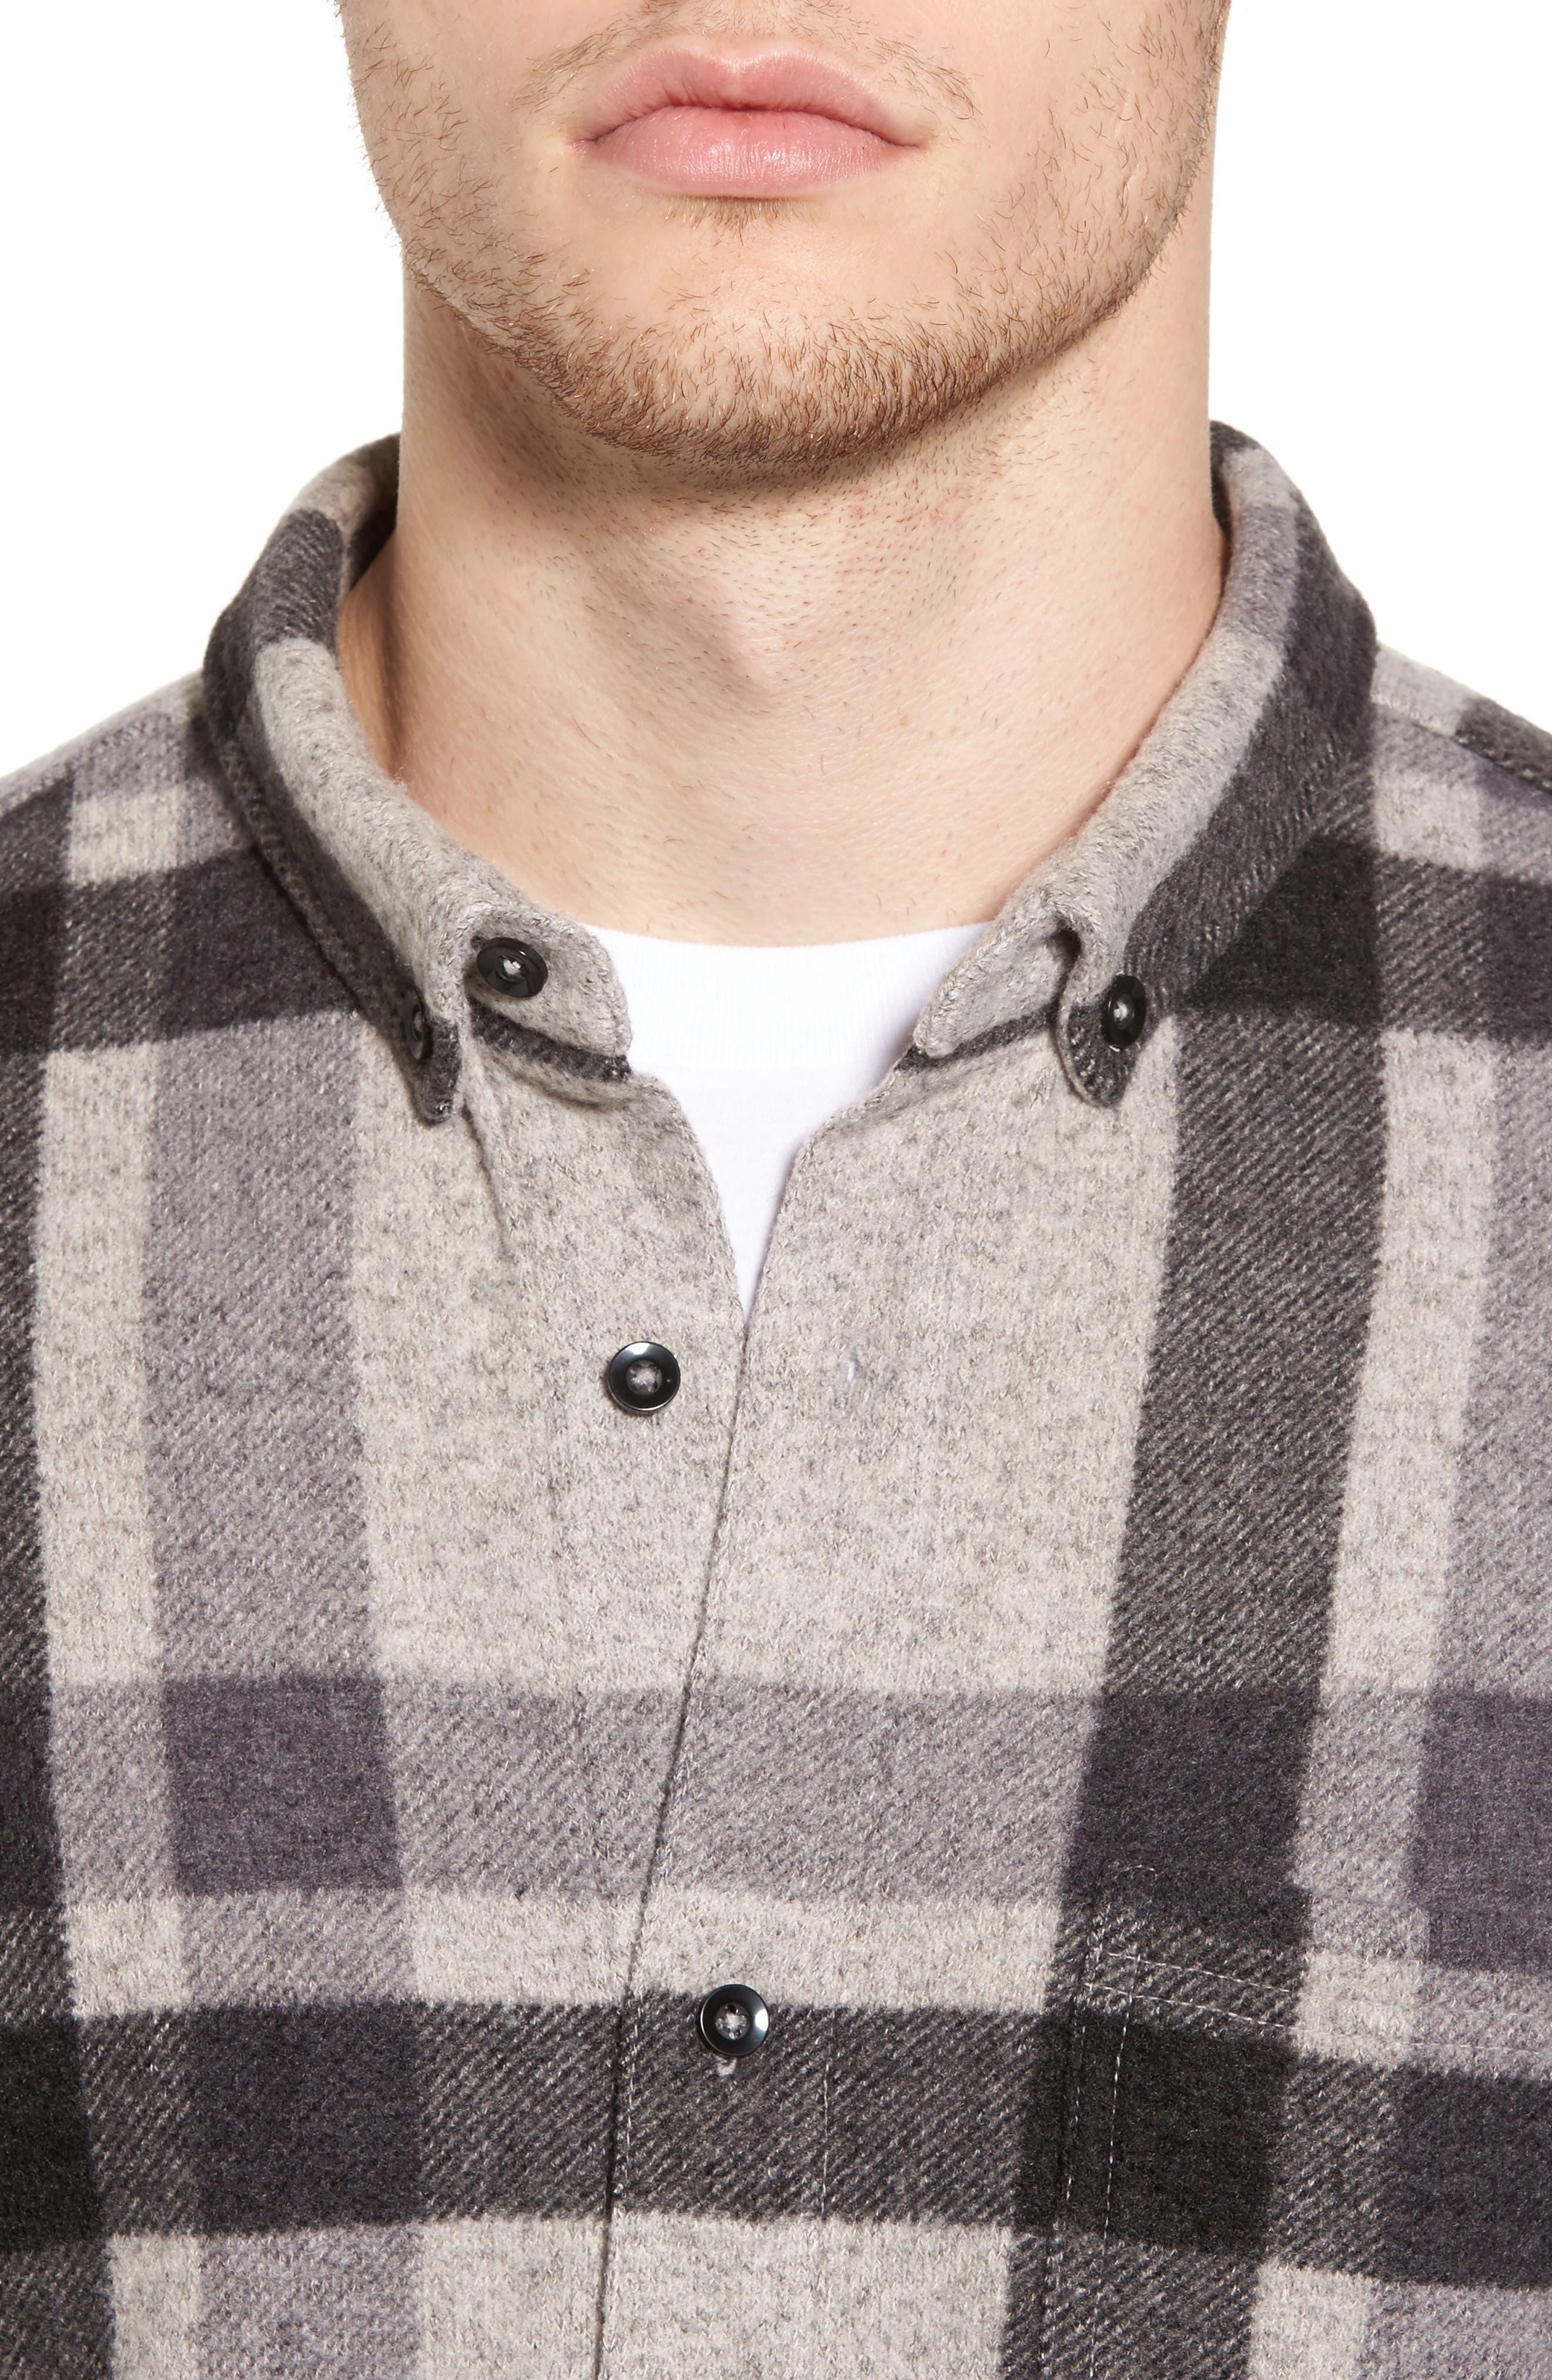 Plaid Shirt,                             Alternate thumbnail 4, color,                             Grey Charcoal Large Plaid